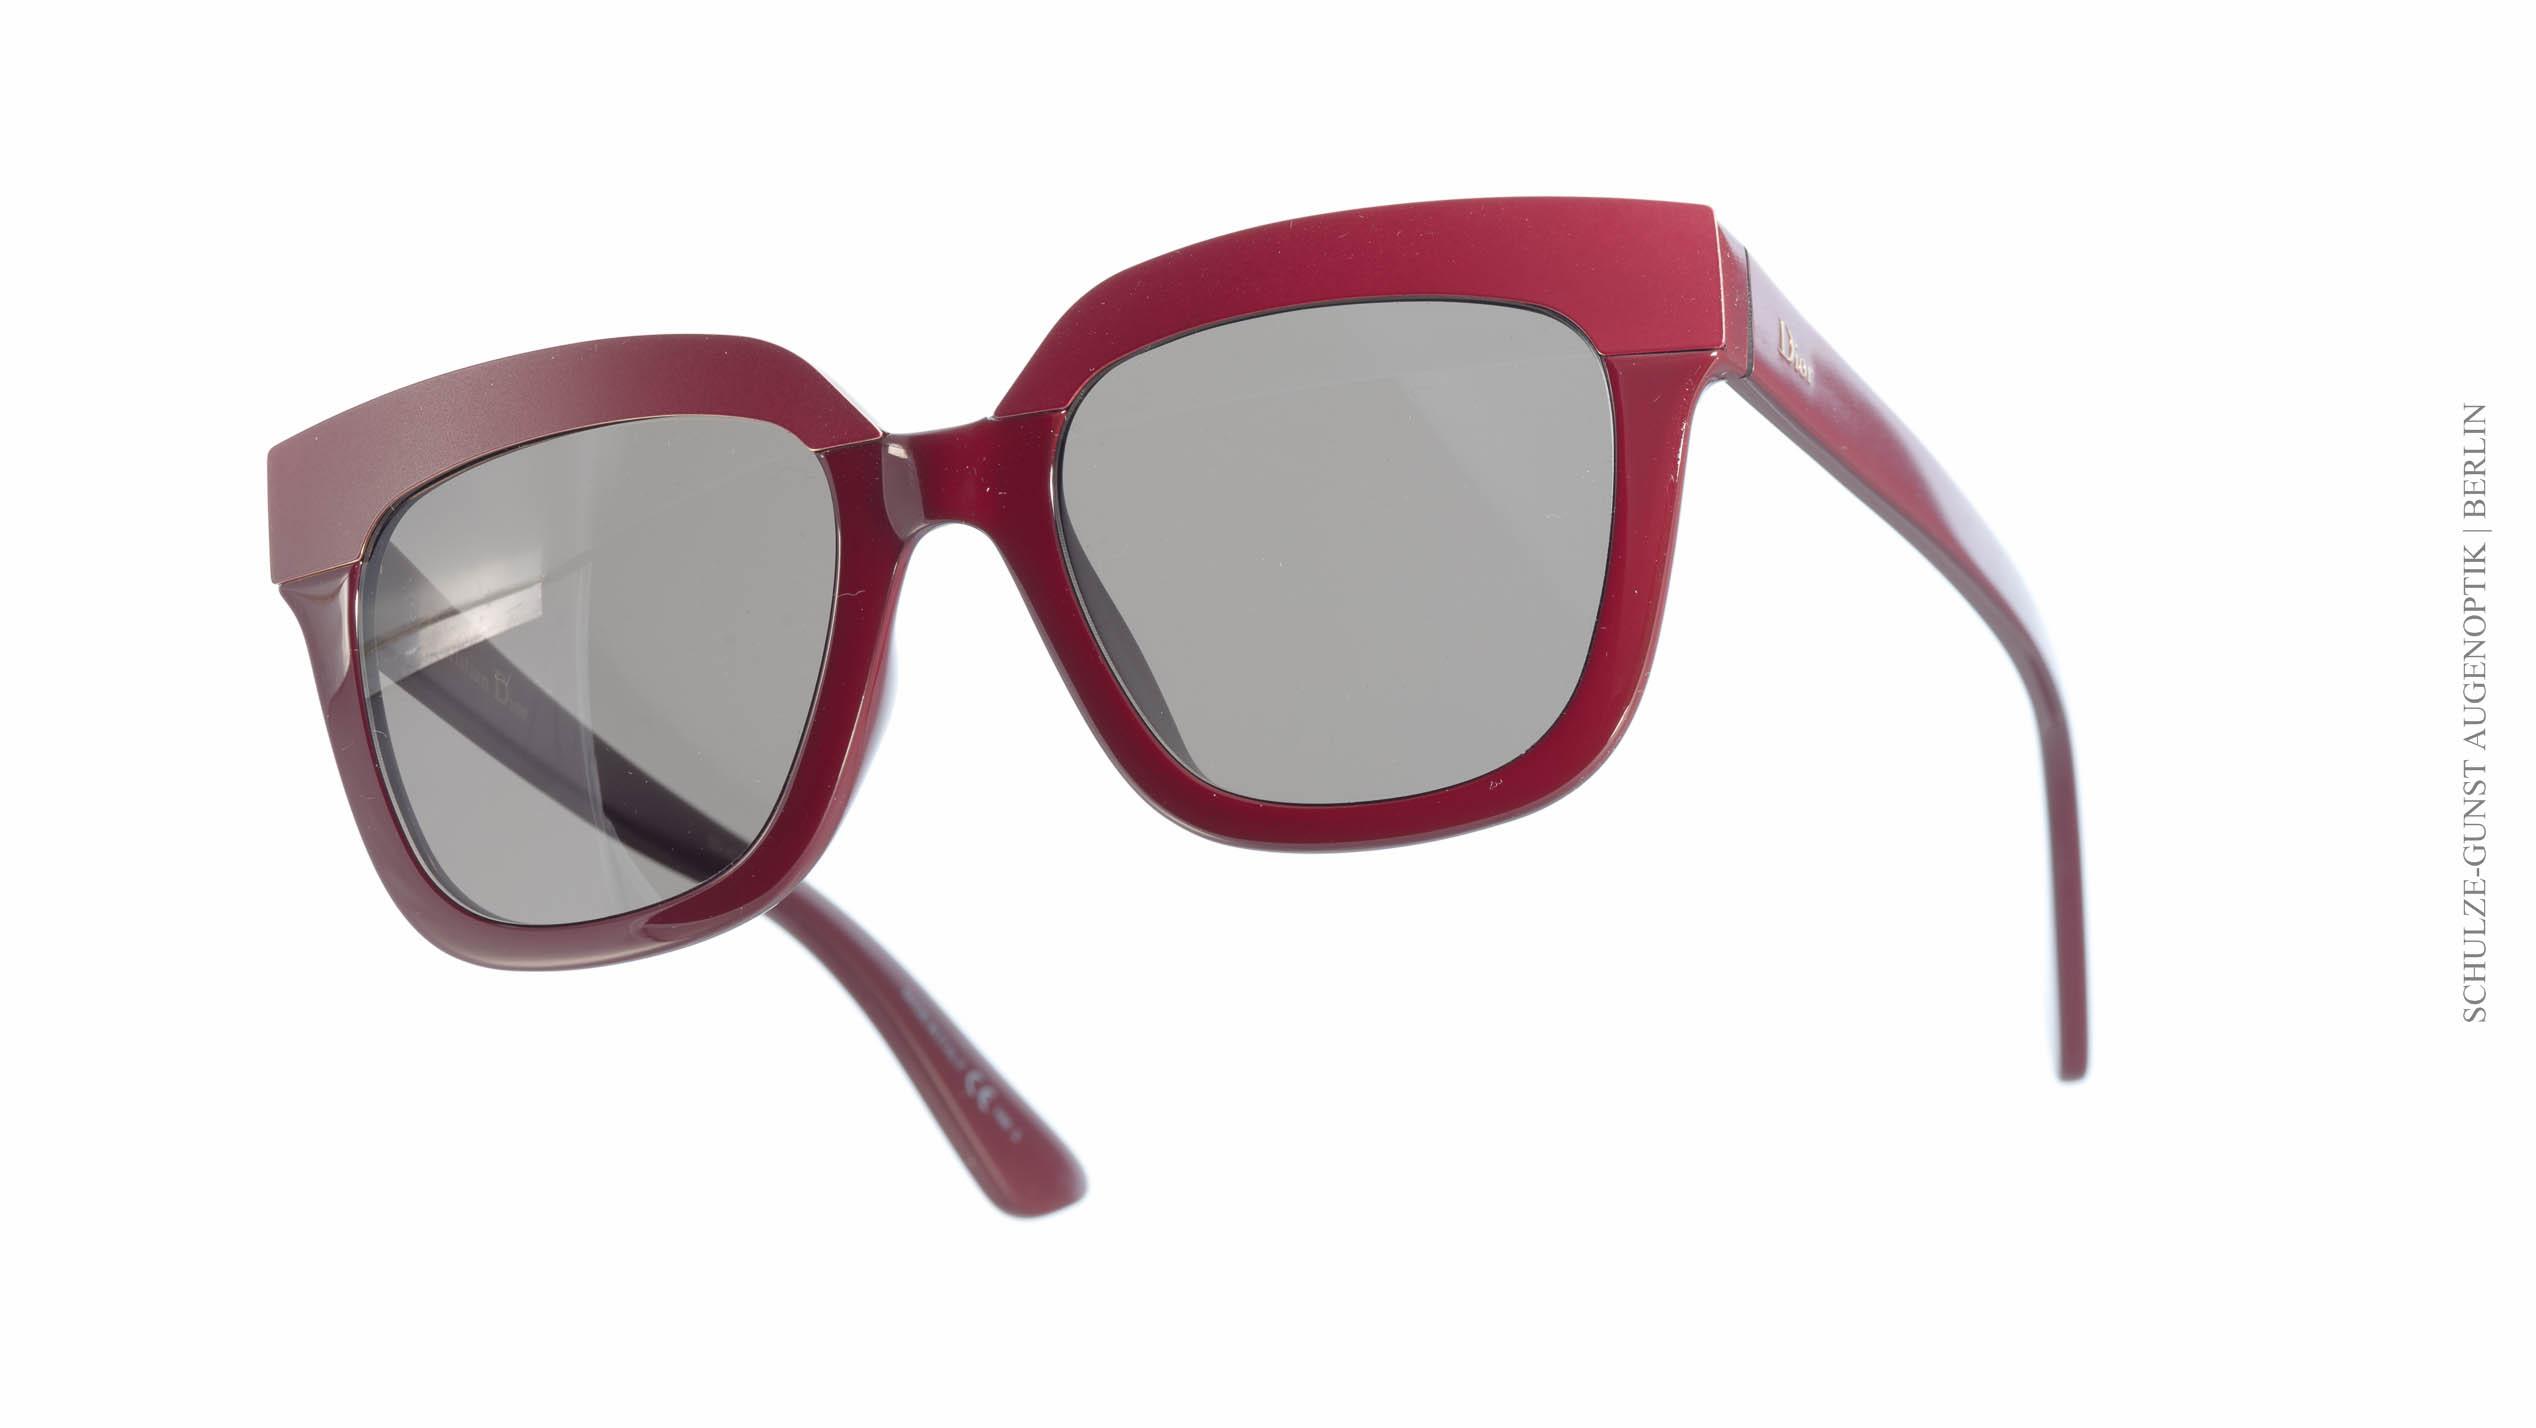 8c59385e8e99e3 8136-dior-soft-2-brillen-kunststoff-acetat-metall-sonnenbrille ...